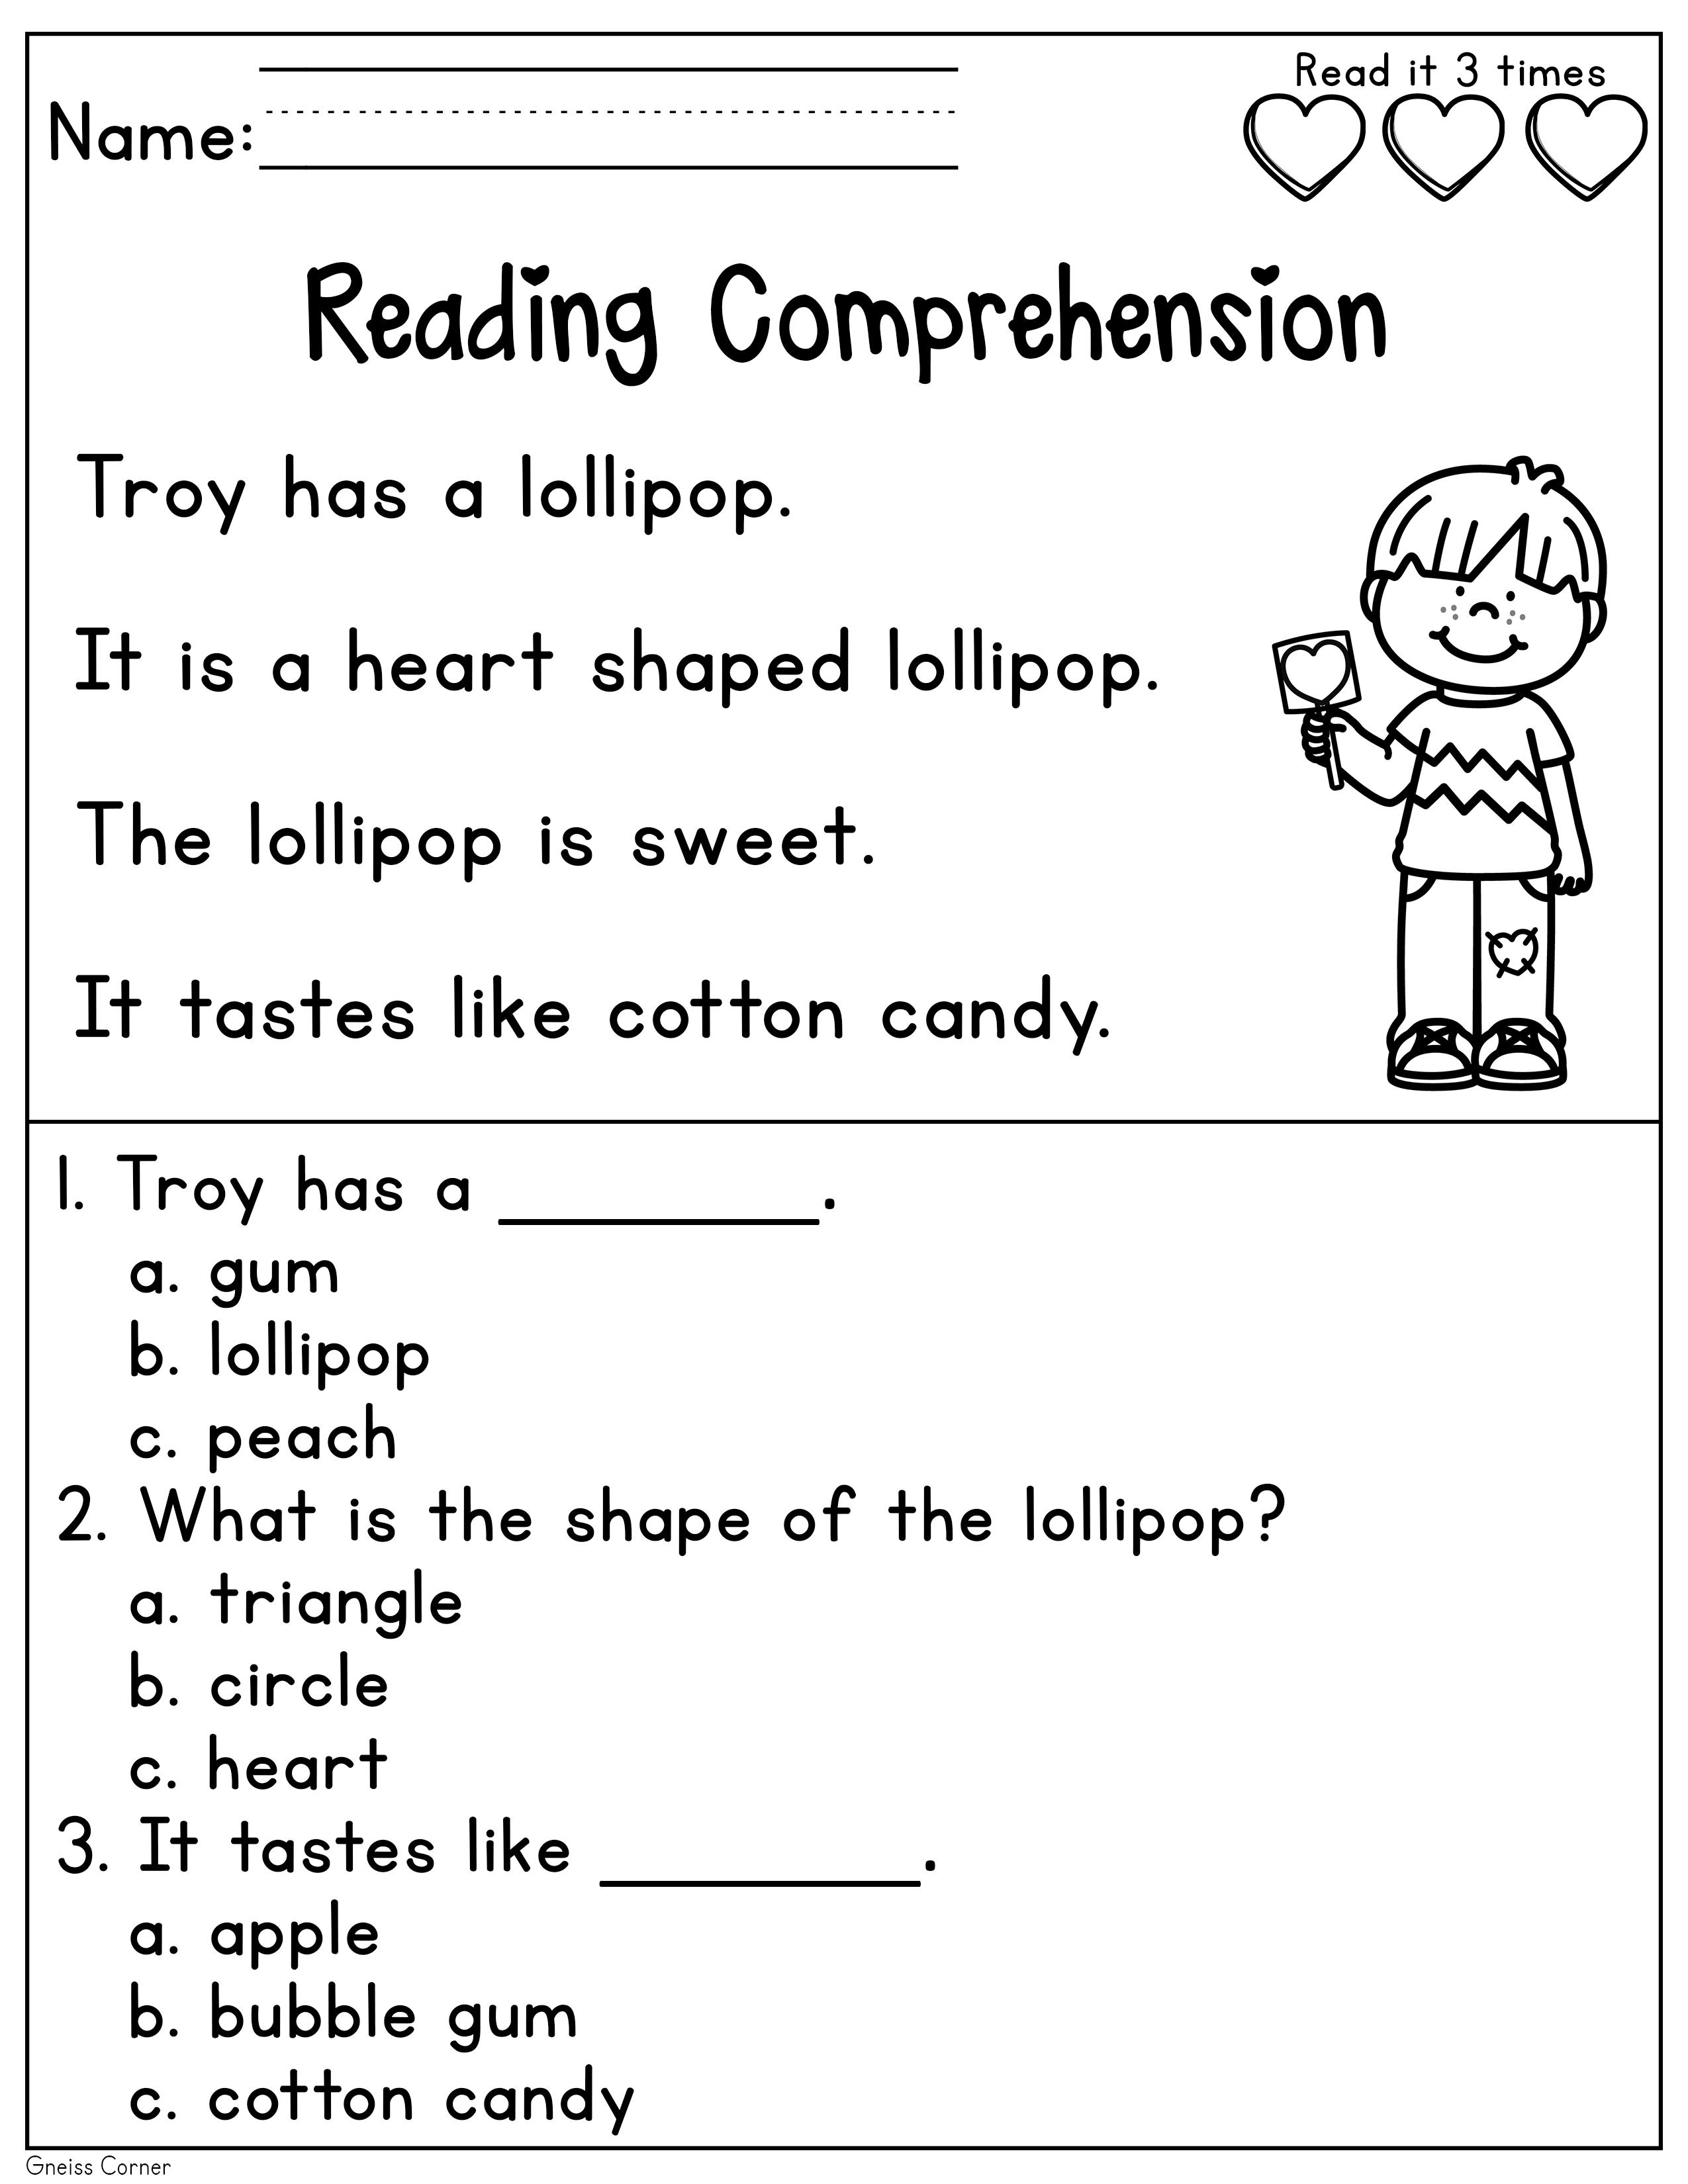 February Valentine S Reading Comprehension Passages Kindergarten Reading Comprehension Kindergarten Reading Comprehension Passages Reading Comprehension [ 3300 x 2550 Pixel ]